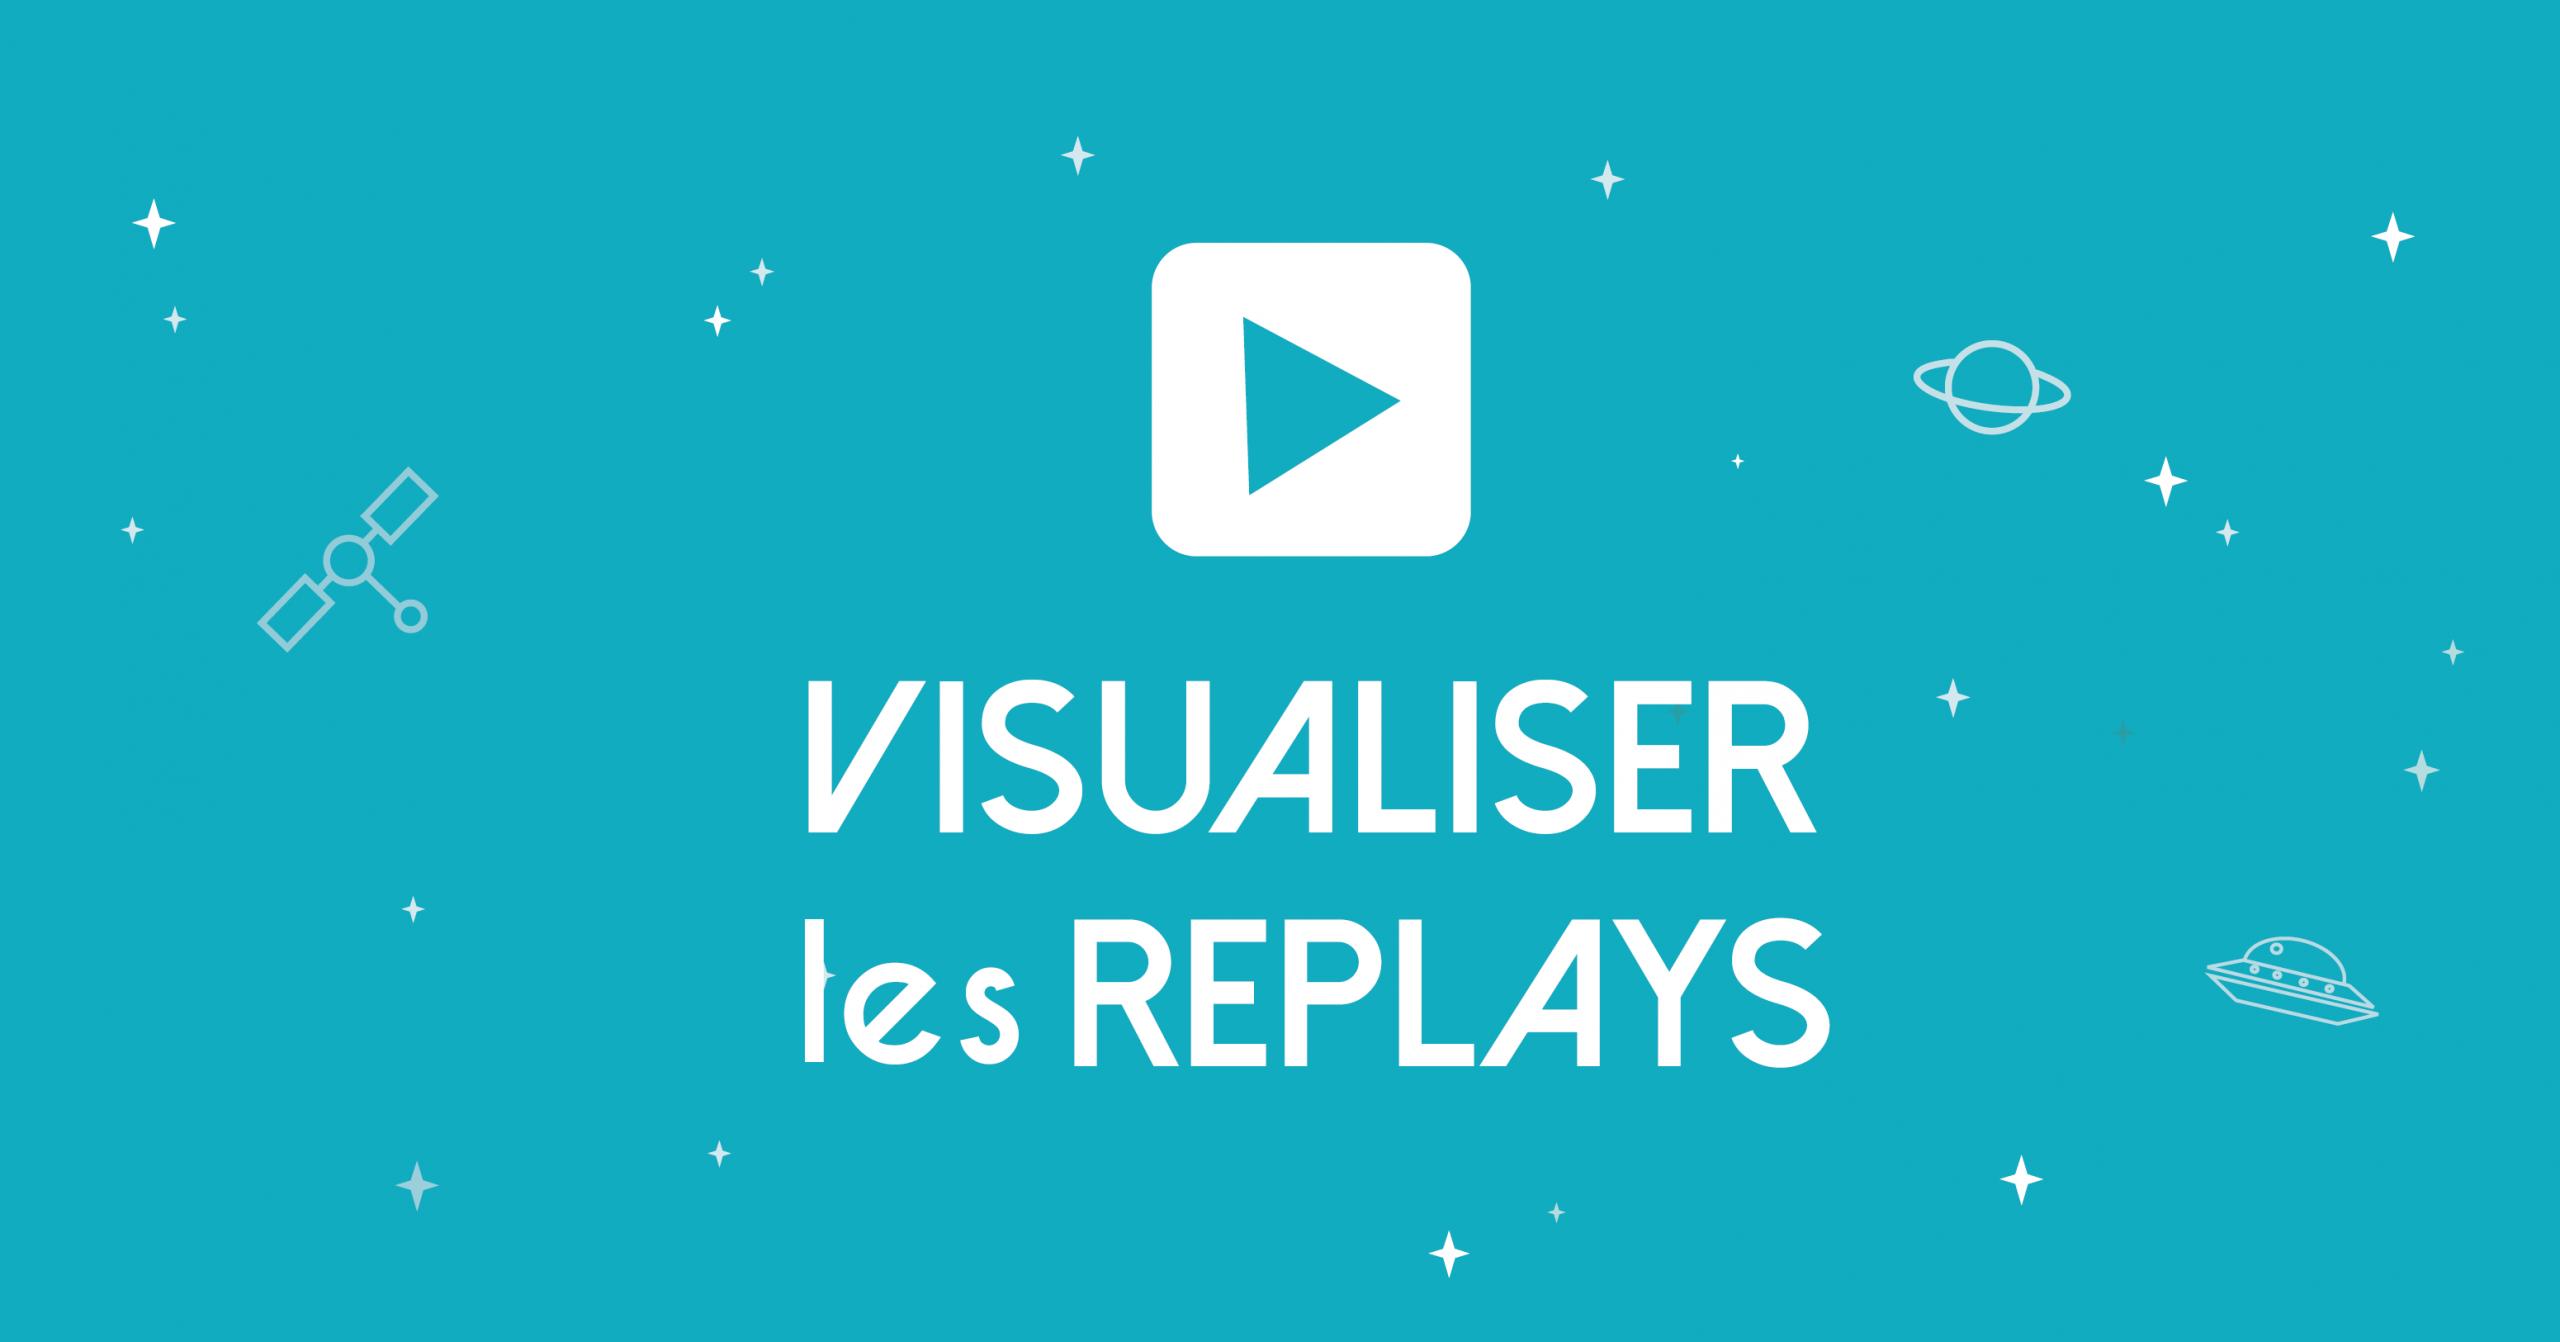 replays webinars constellation